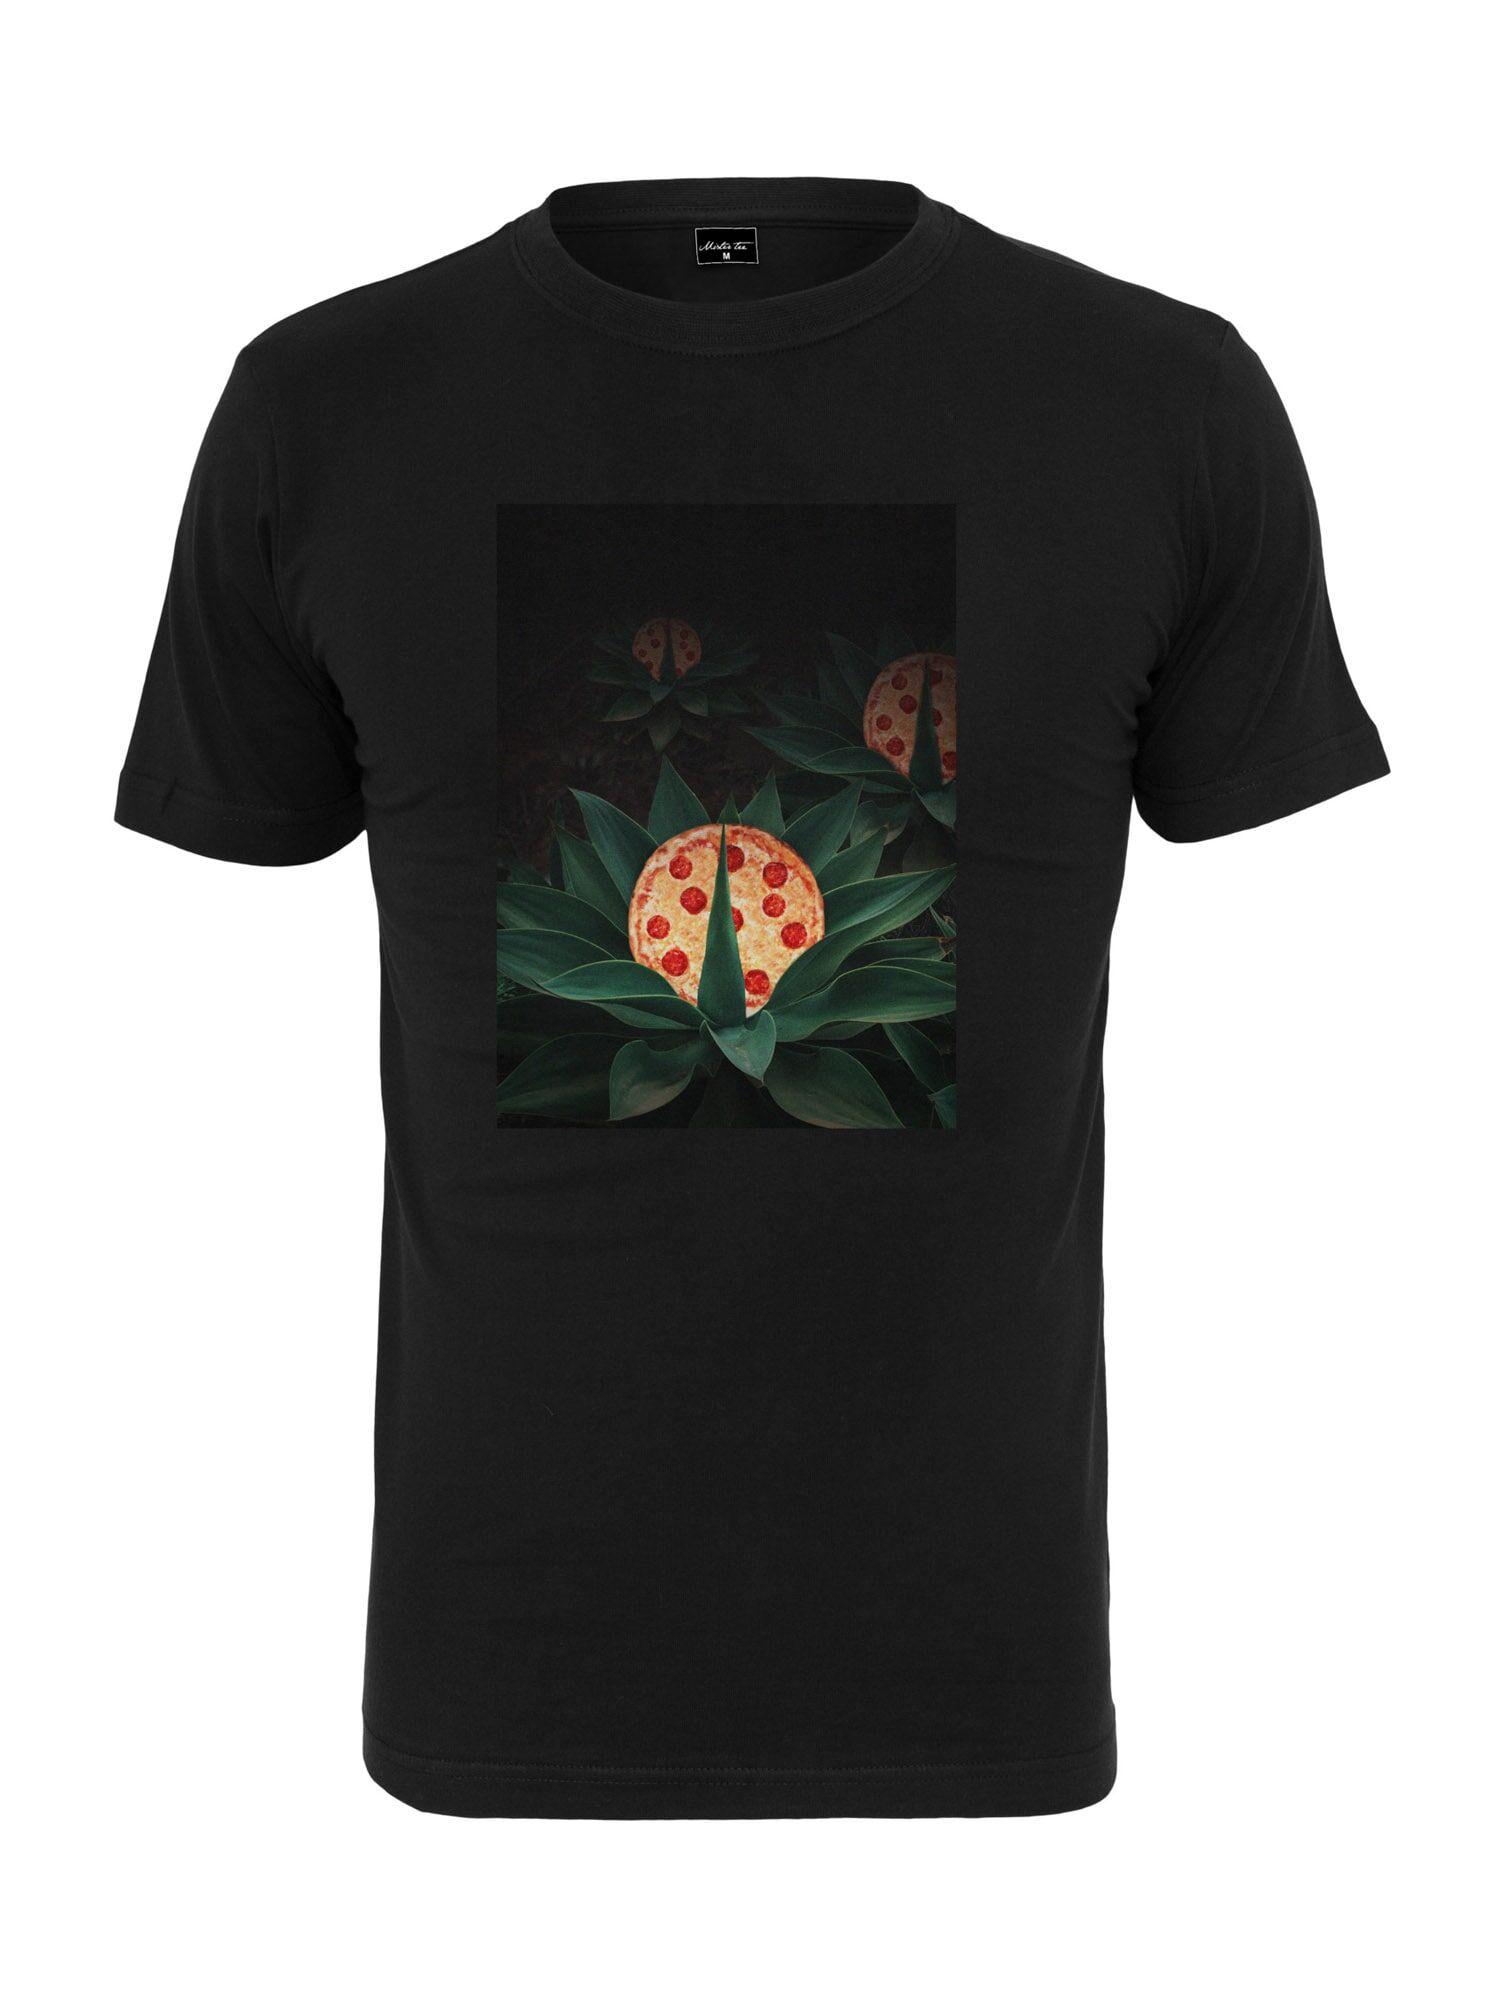 Tee T-Shirt 'Pizza Plant'  - Noir - Taille: XS - male